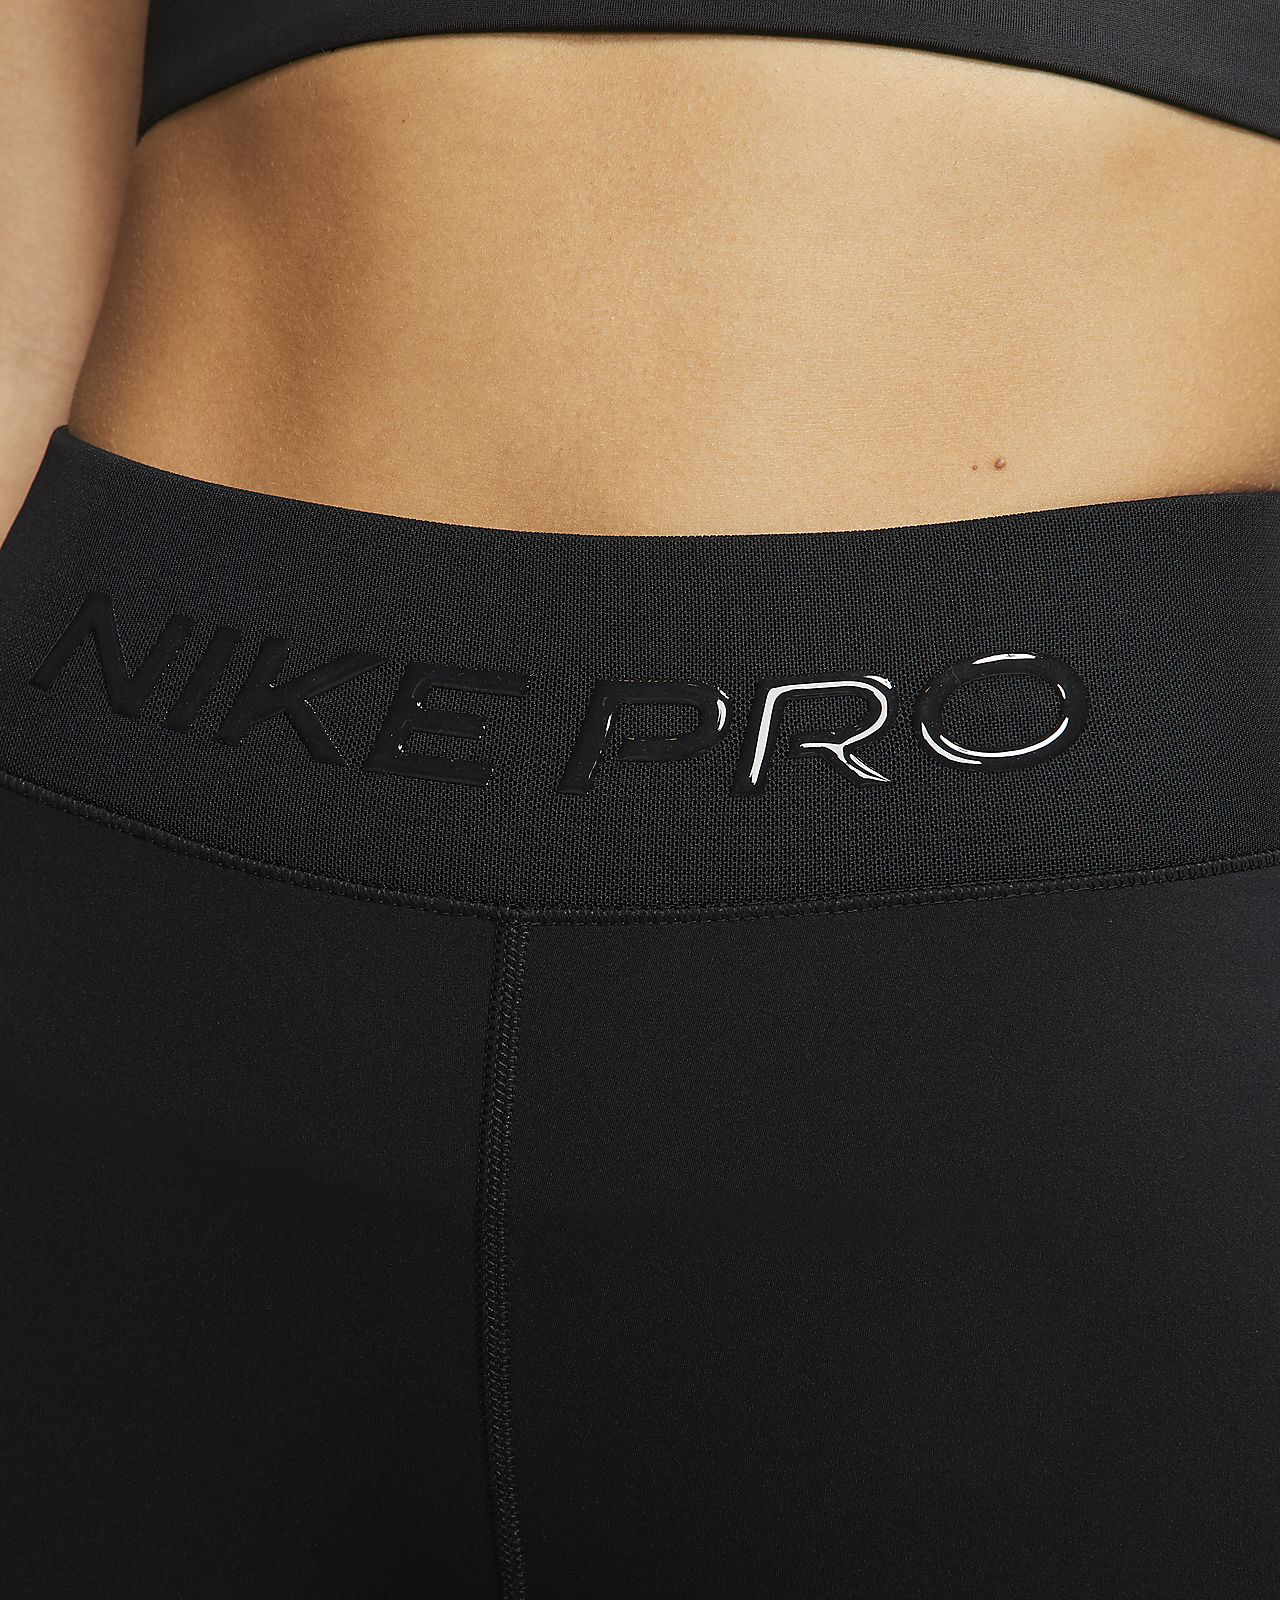 Nike Pro Damesshorts (21 cm)